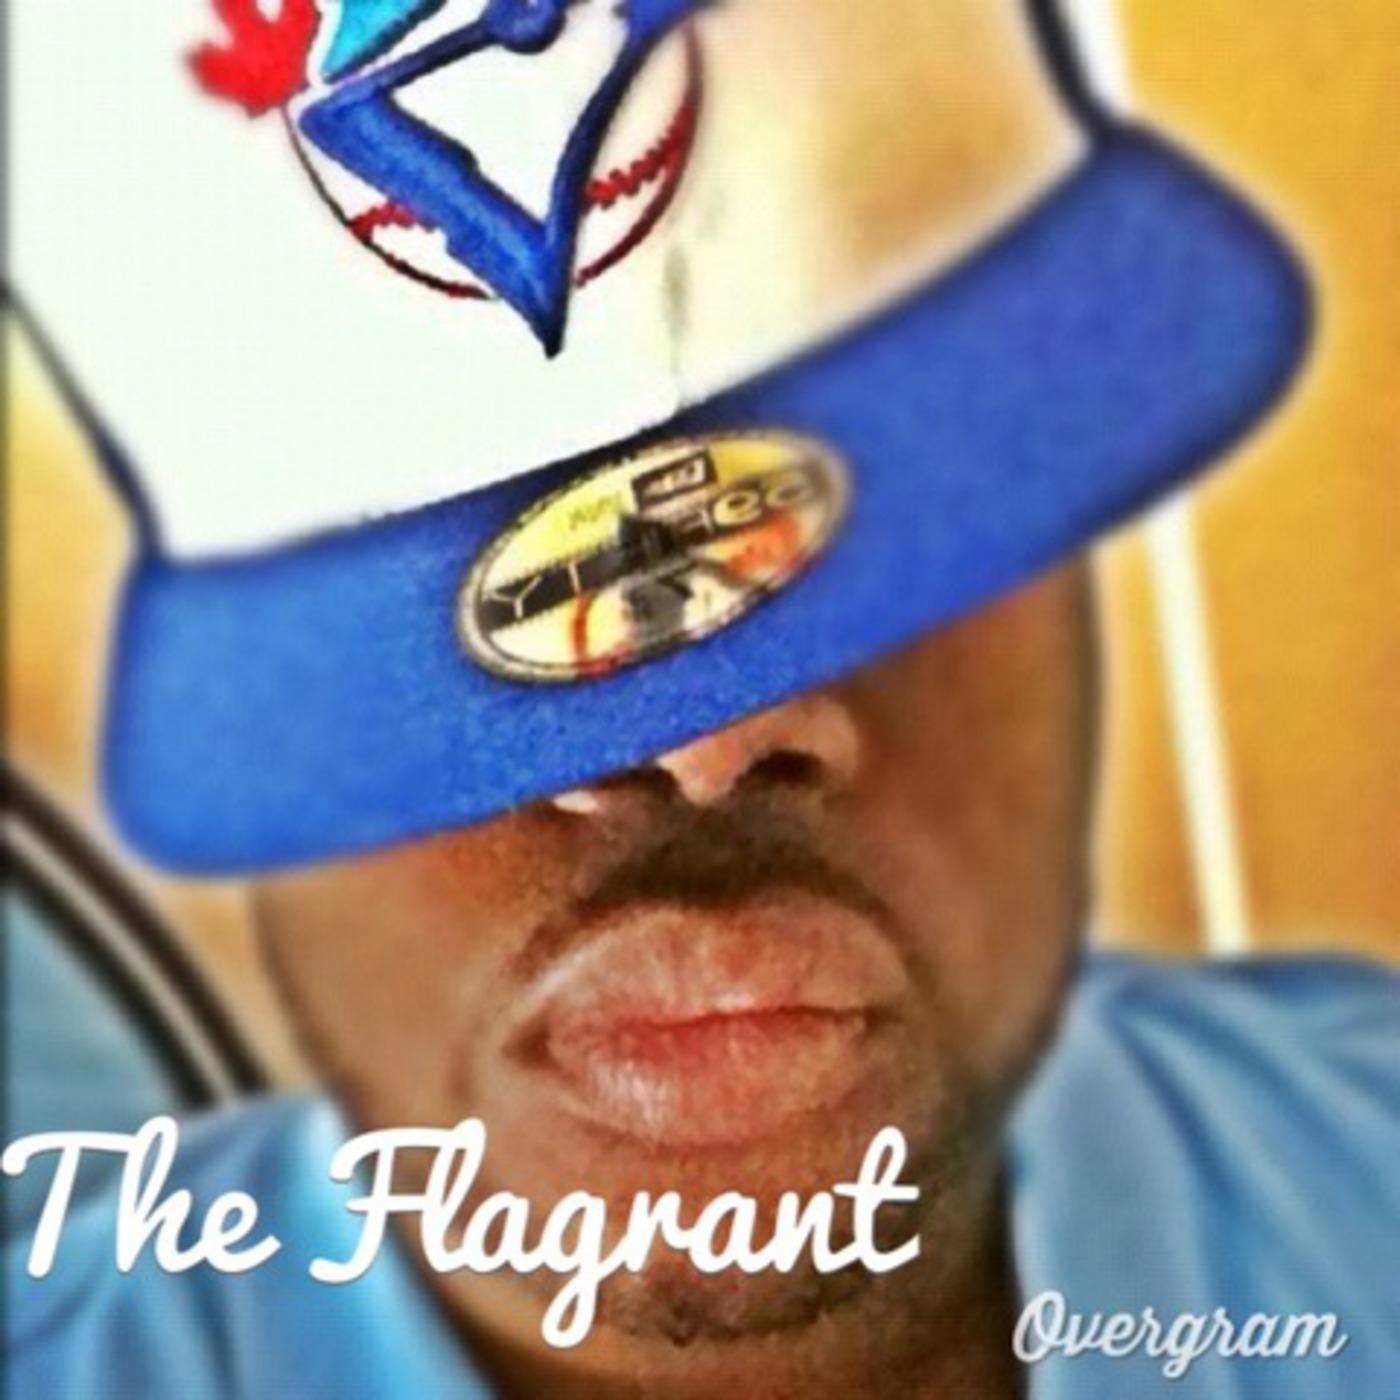 TheFlagrant